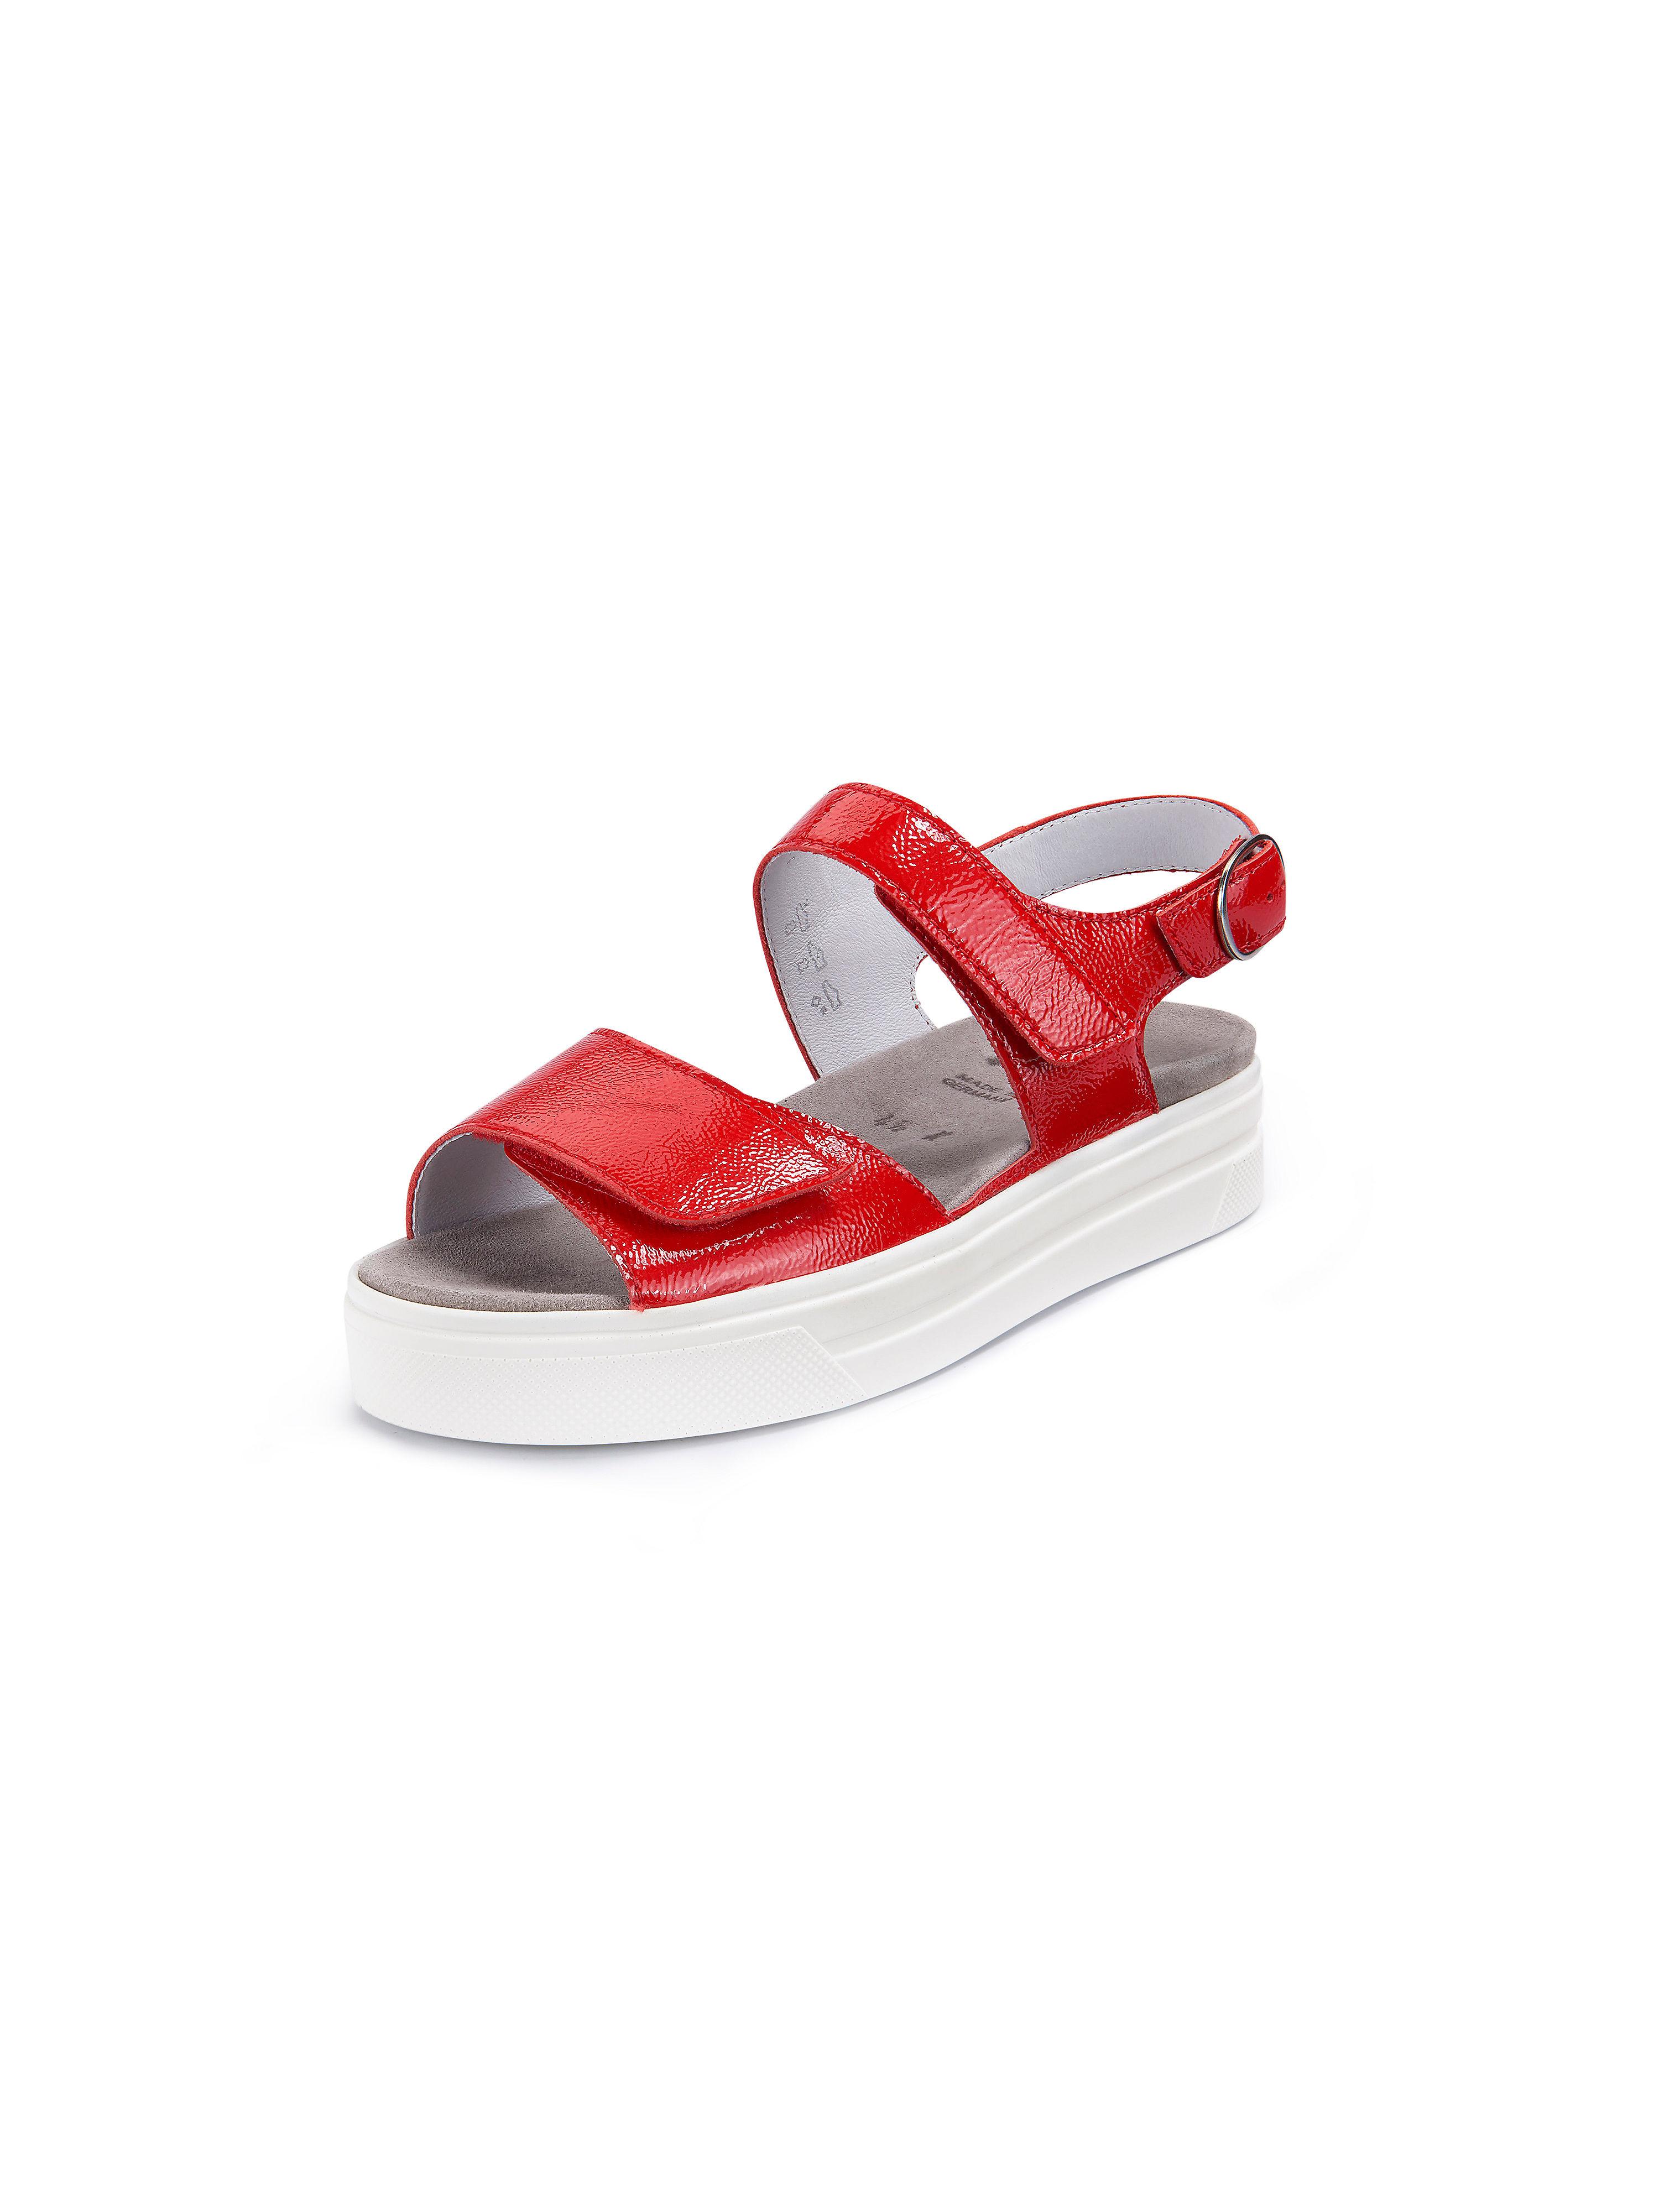 Les sandales Katrin  Semler rouge taille 36